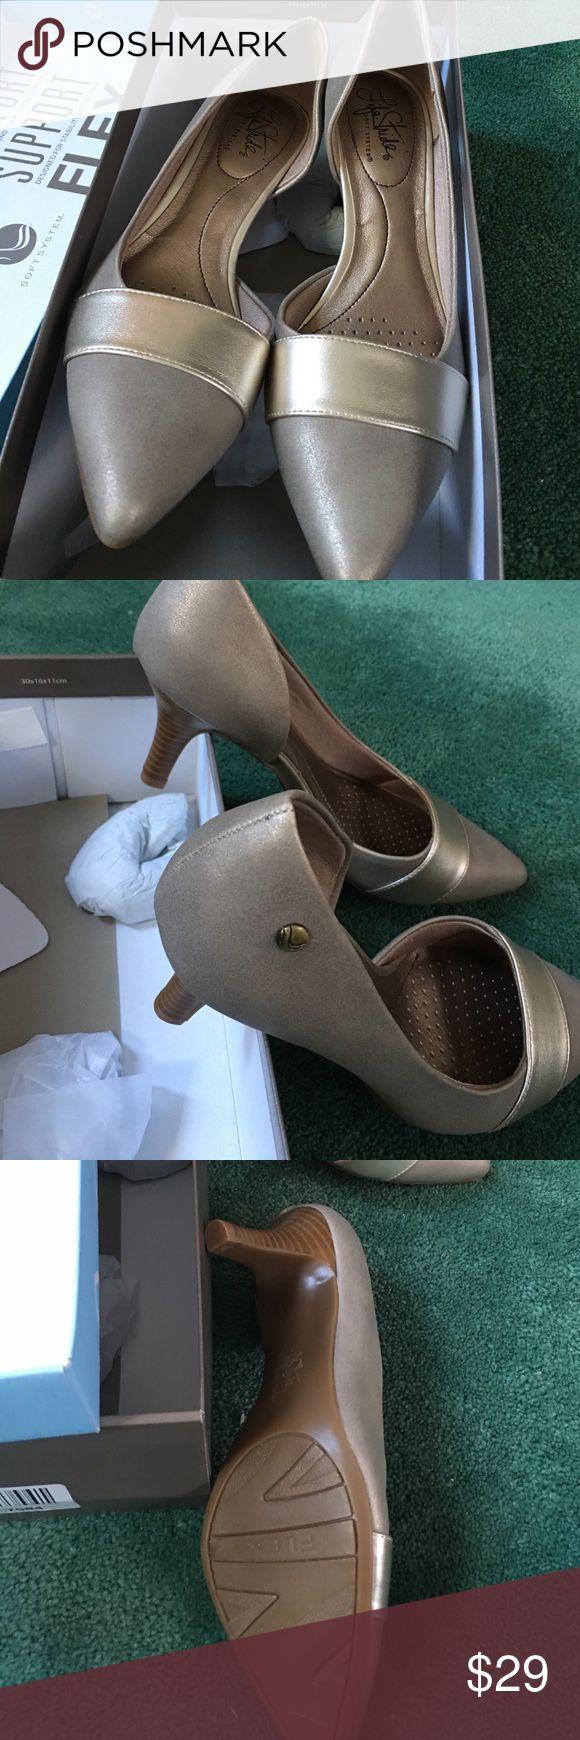 Life stride gold metallic pumps. BNIB. SIZE 7.5 Never worn comfortable shoe. Low heel. Nice metallic color. Life Stride Shoes Heels